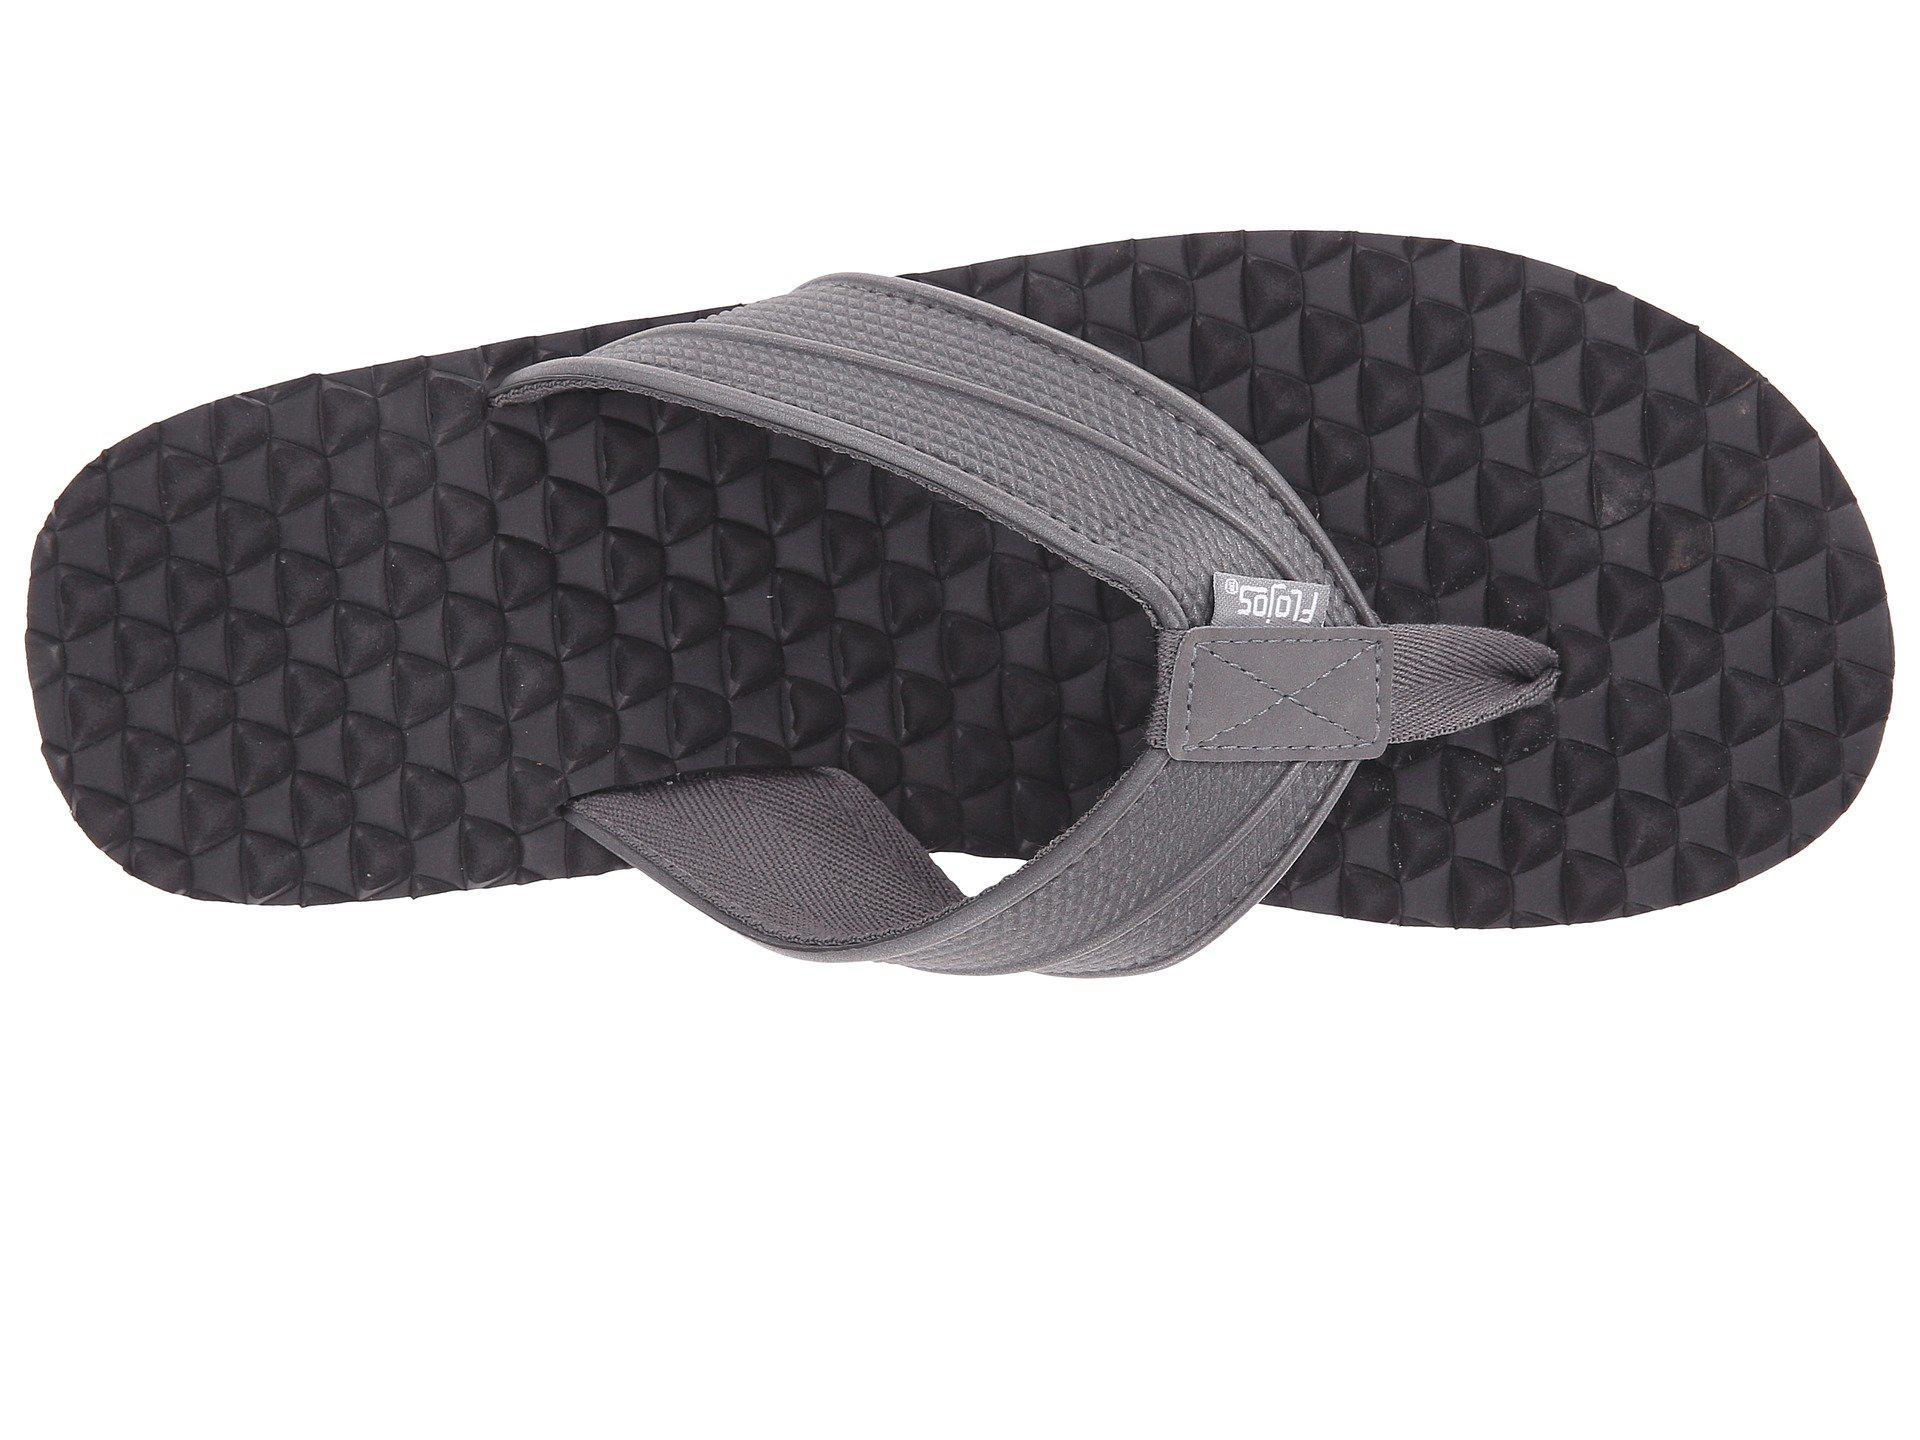 6b222ad33312 Flojos - Badlands (black light Gray) Men s Sandals for Men - Lyst. View  fullscreen